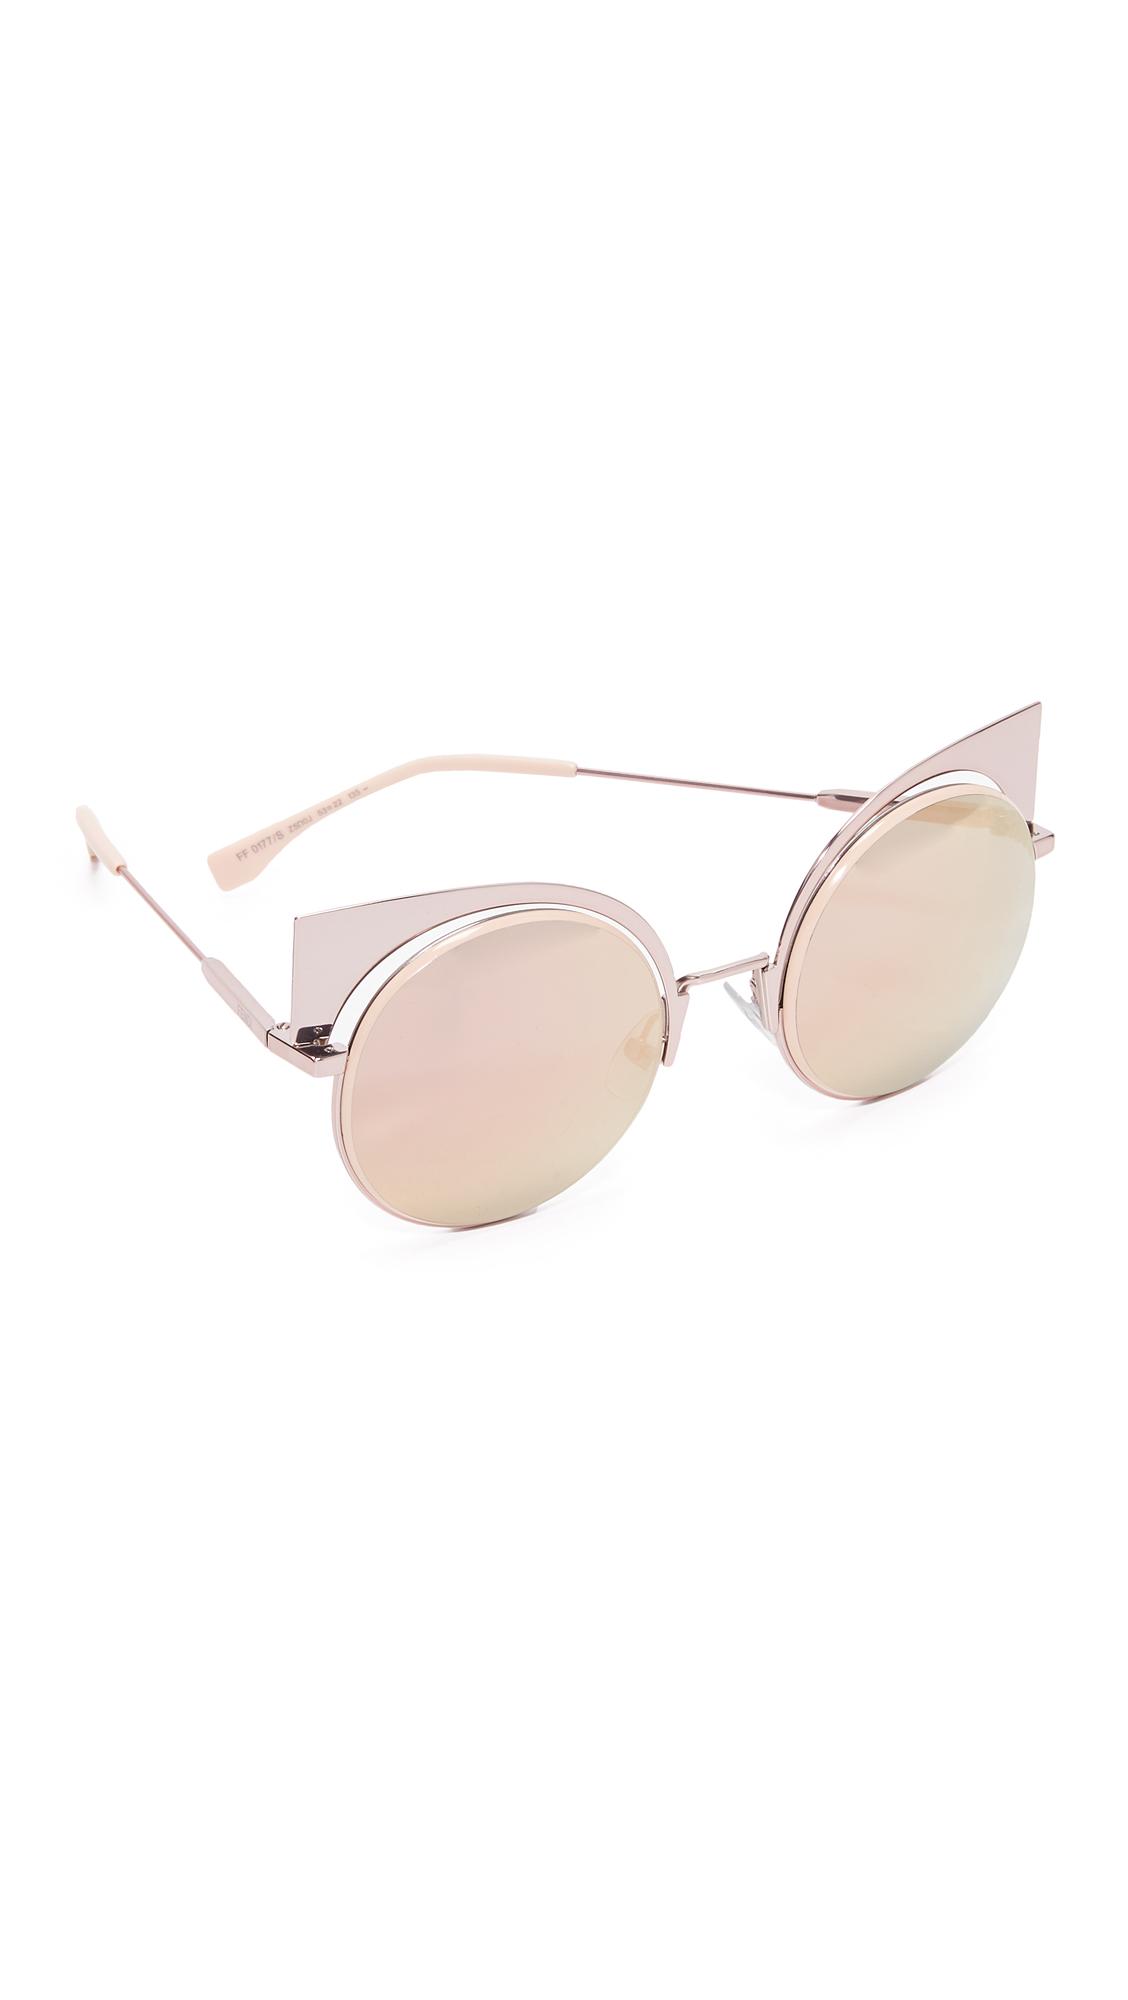 Fendi Cat Eye Mirrored Sunglasses - Pink/Rose Gold at Shopbop